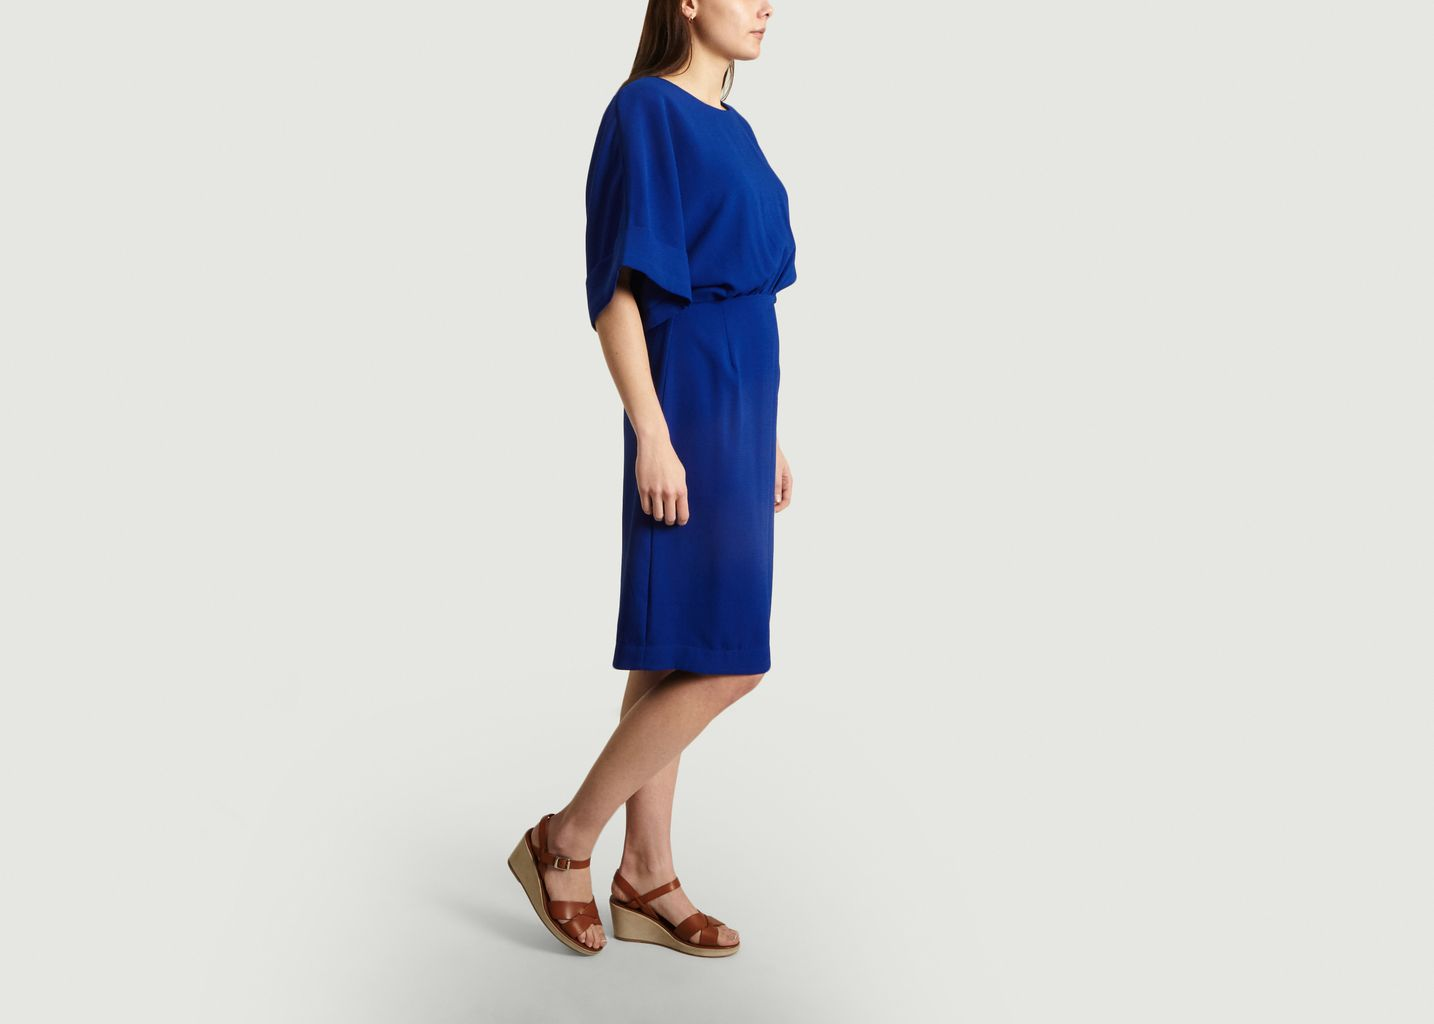 Robe Bleue Évasée et Manches Courtes - Essentiel Antwerp